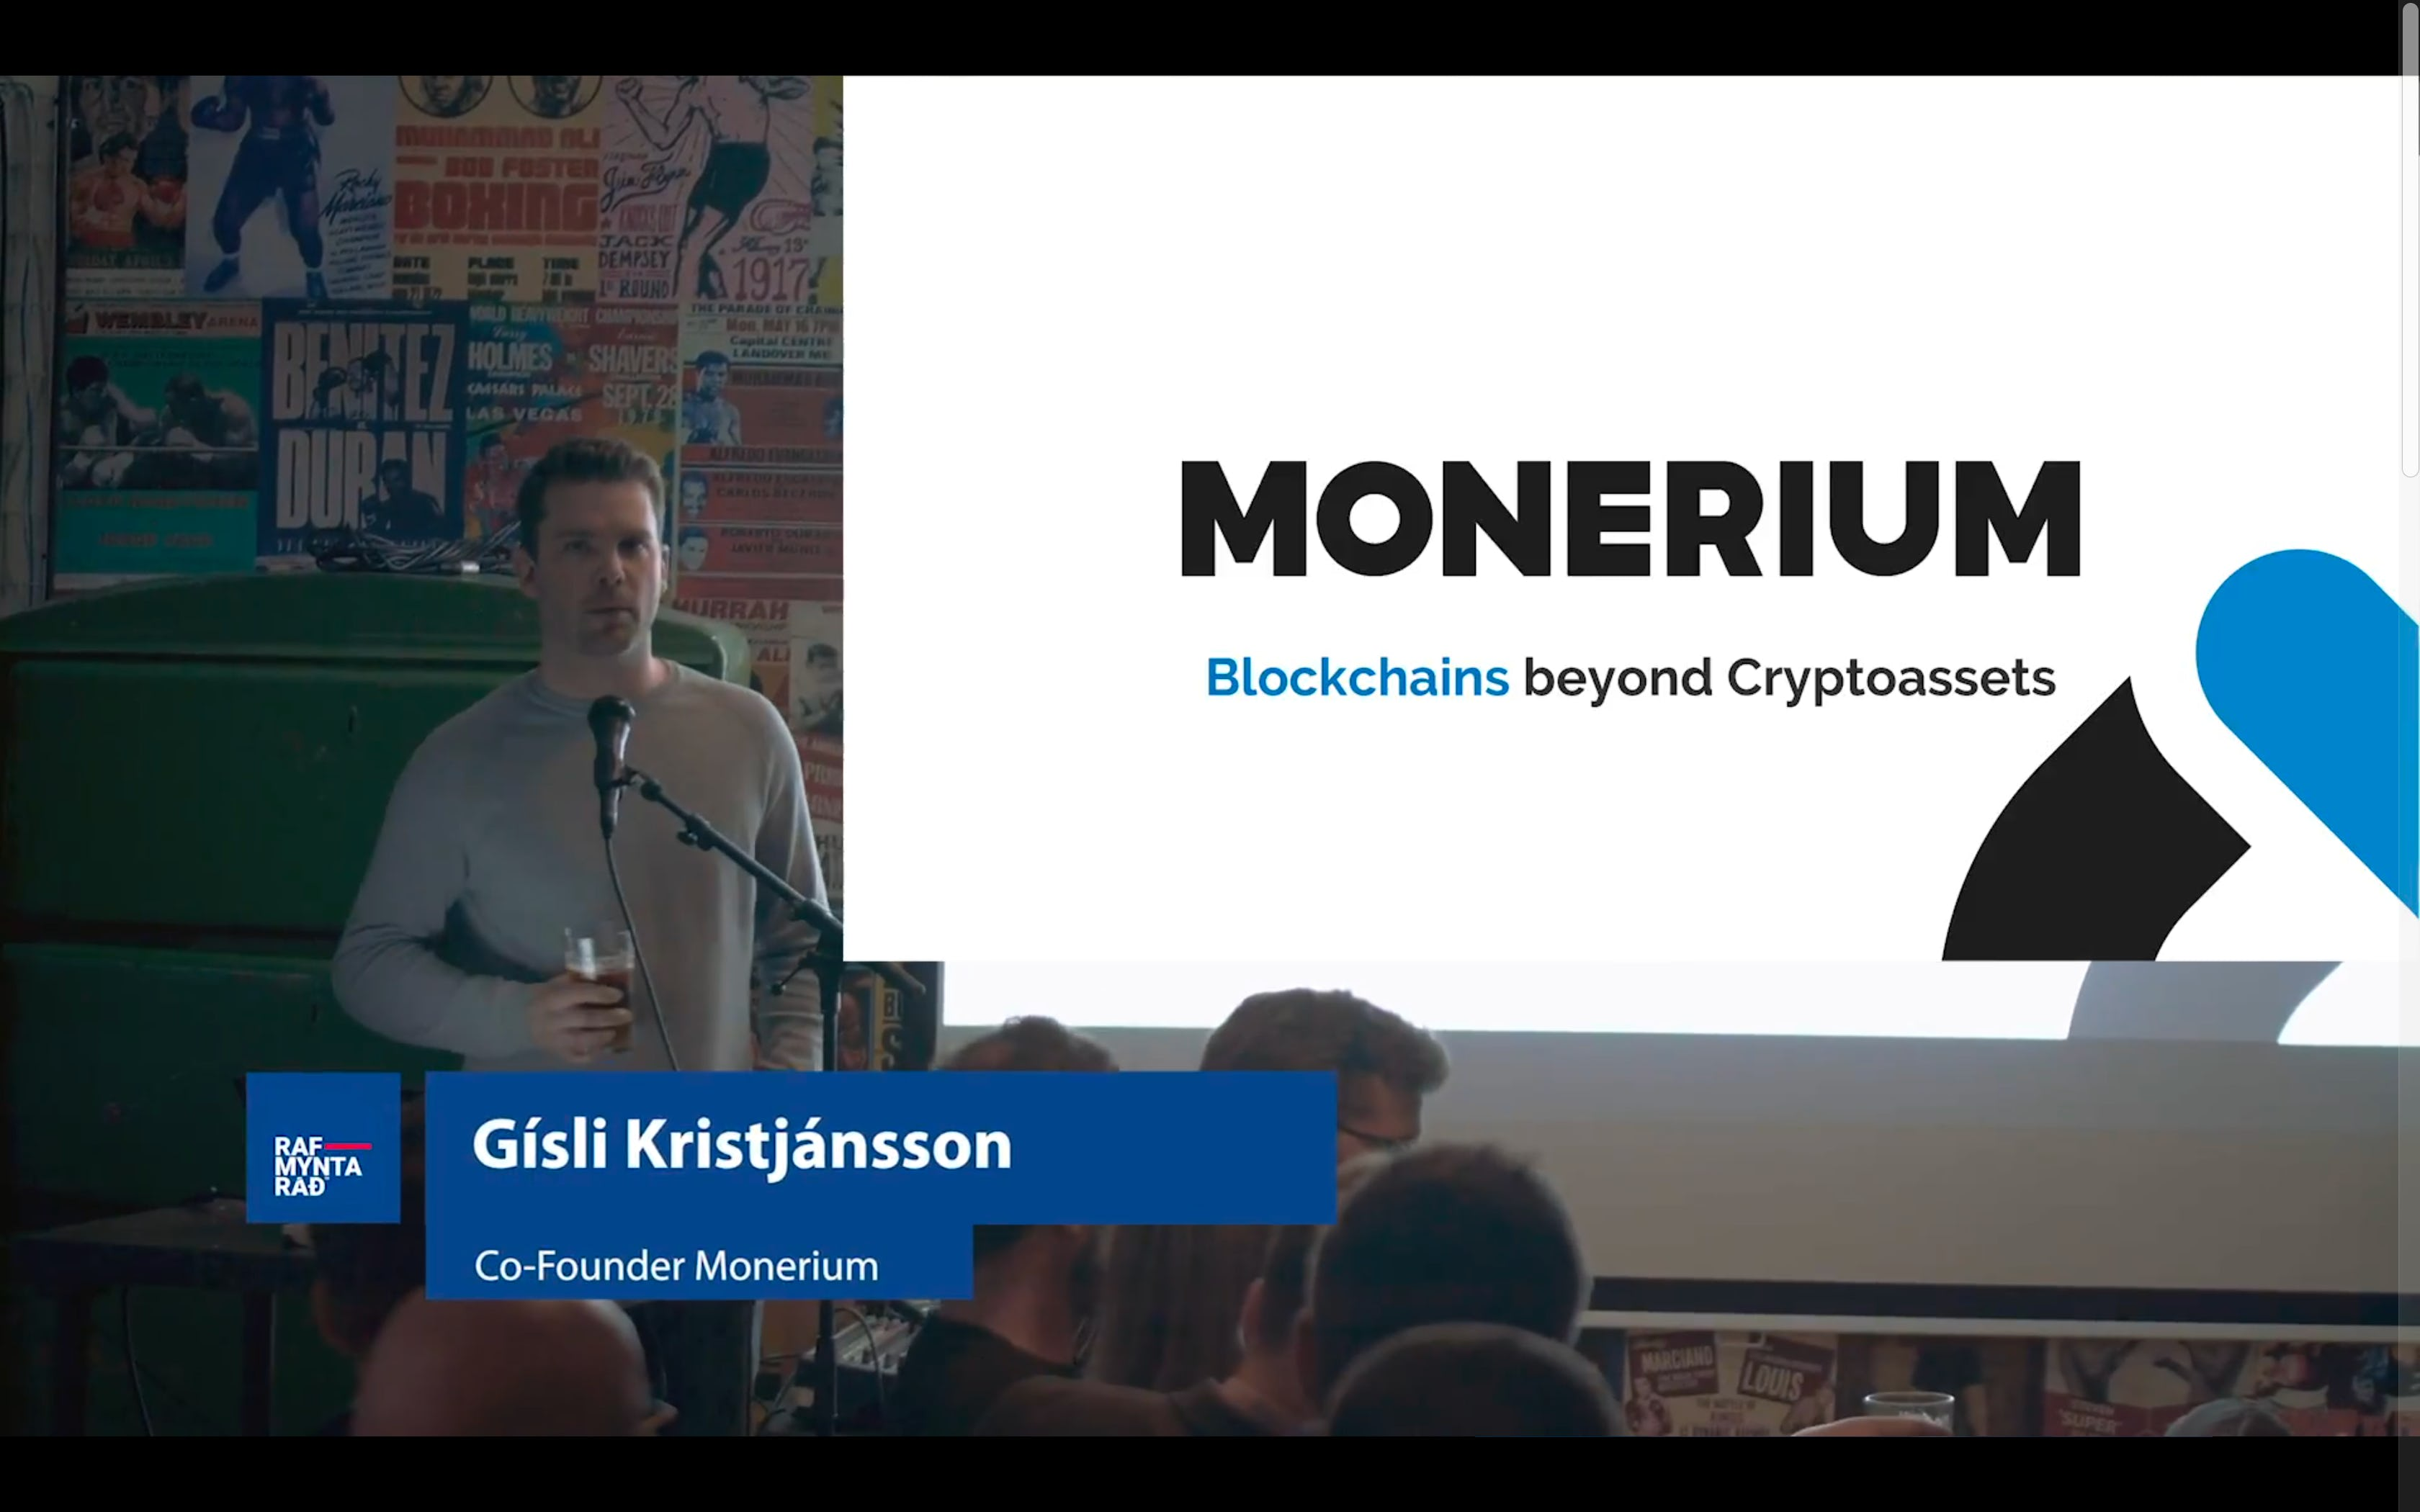 Blockchains Beyond Cryptoassets - Gisli Kristjansson